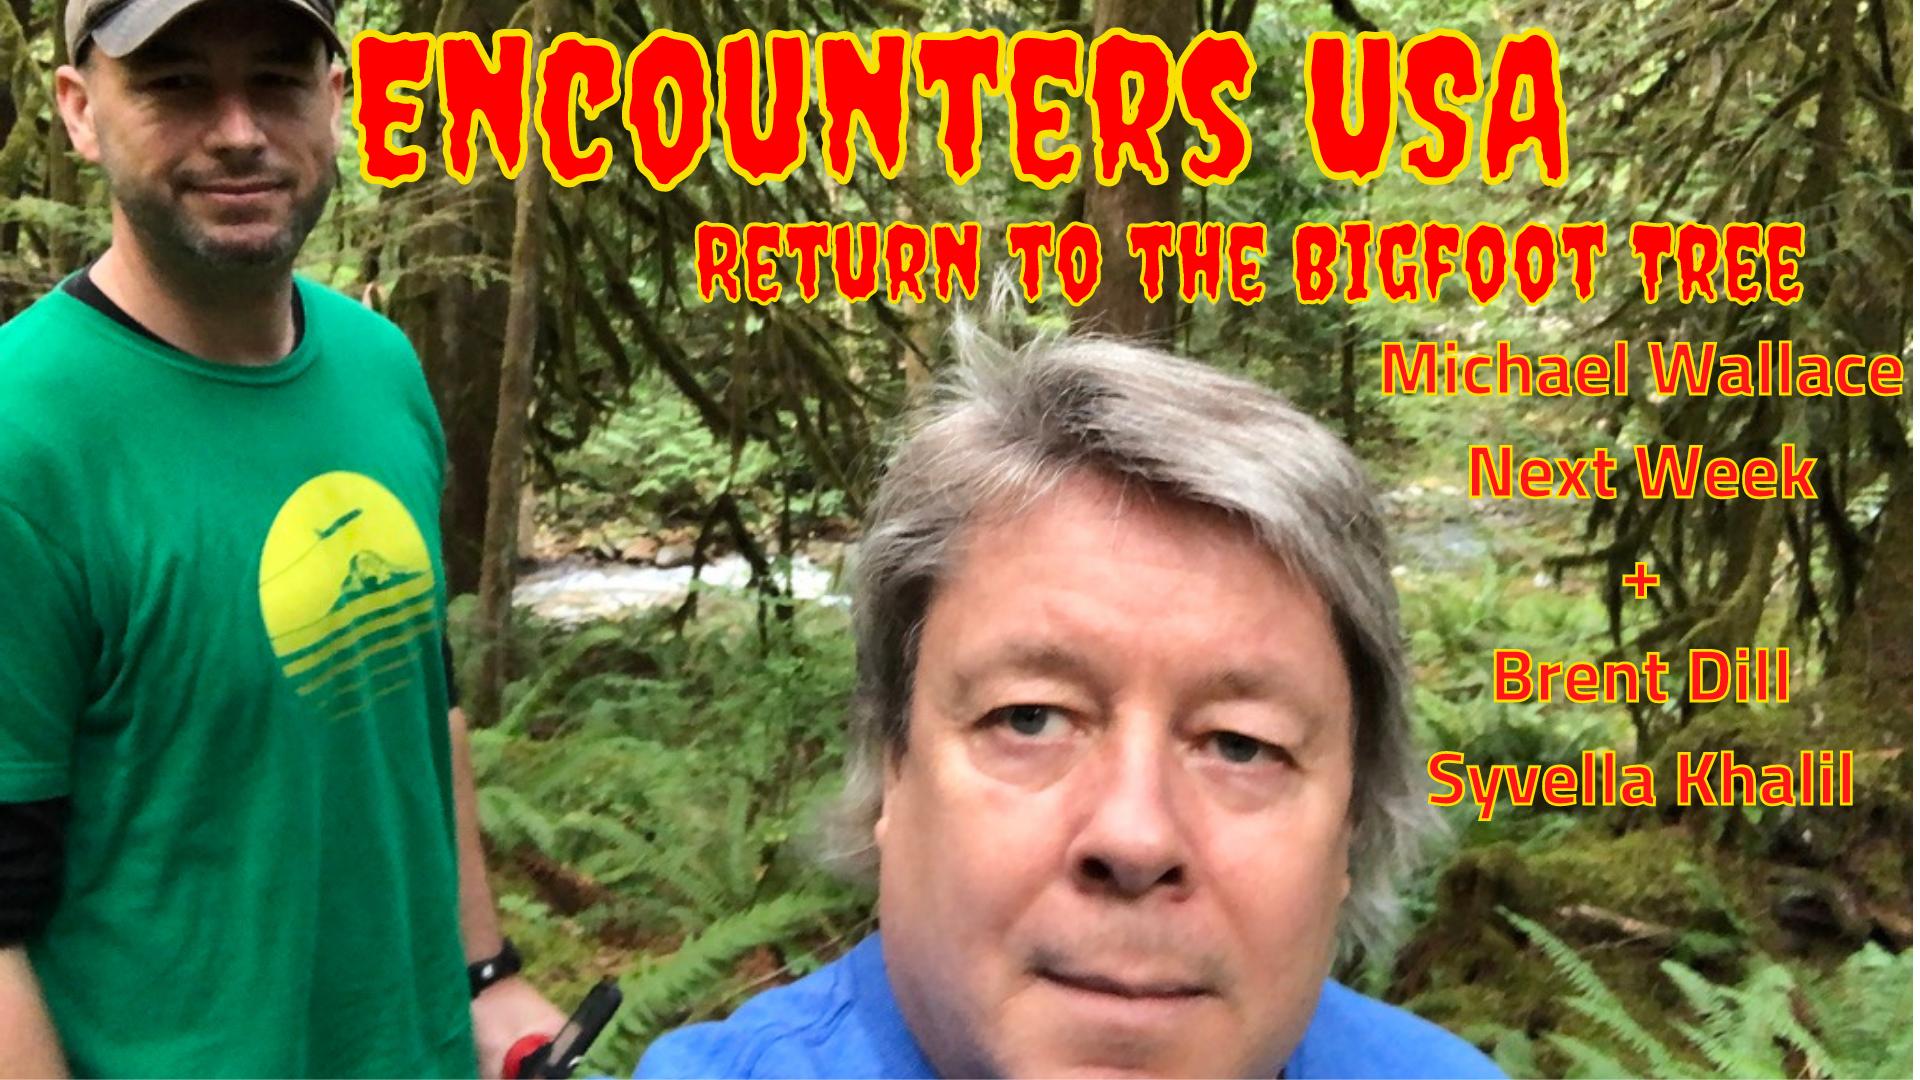 Return to the Bigfoot Tree